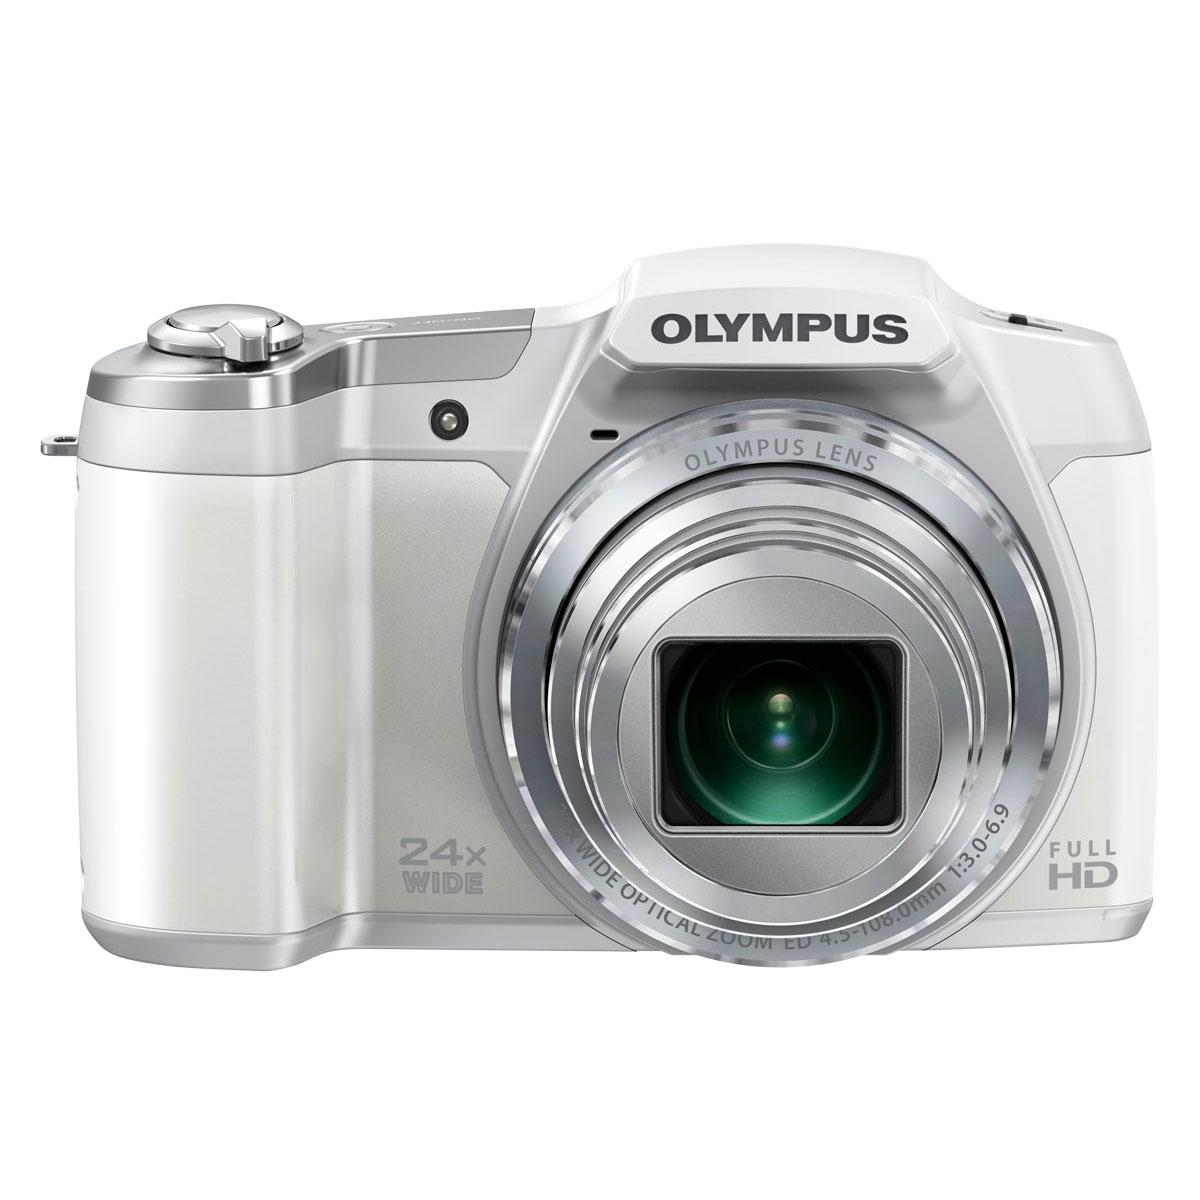 olympus sz 16 blanc appareil photo num rique olympus sur. Black Bedroom Furniture Sets. Home Design Ideas